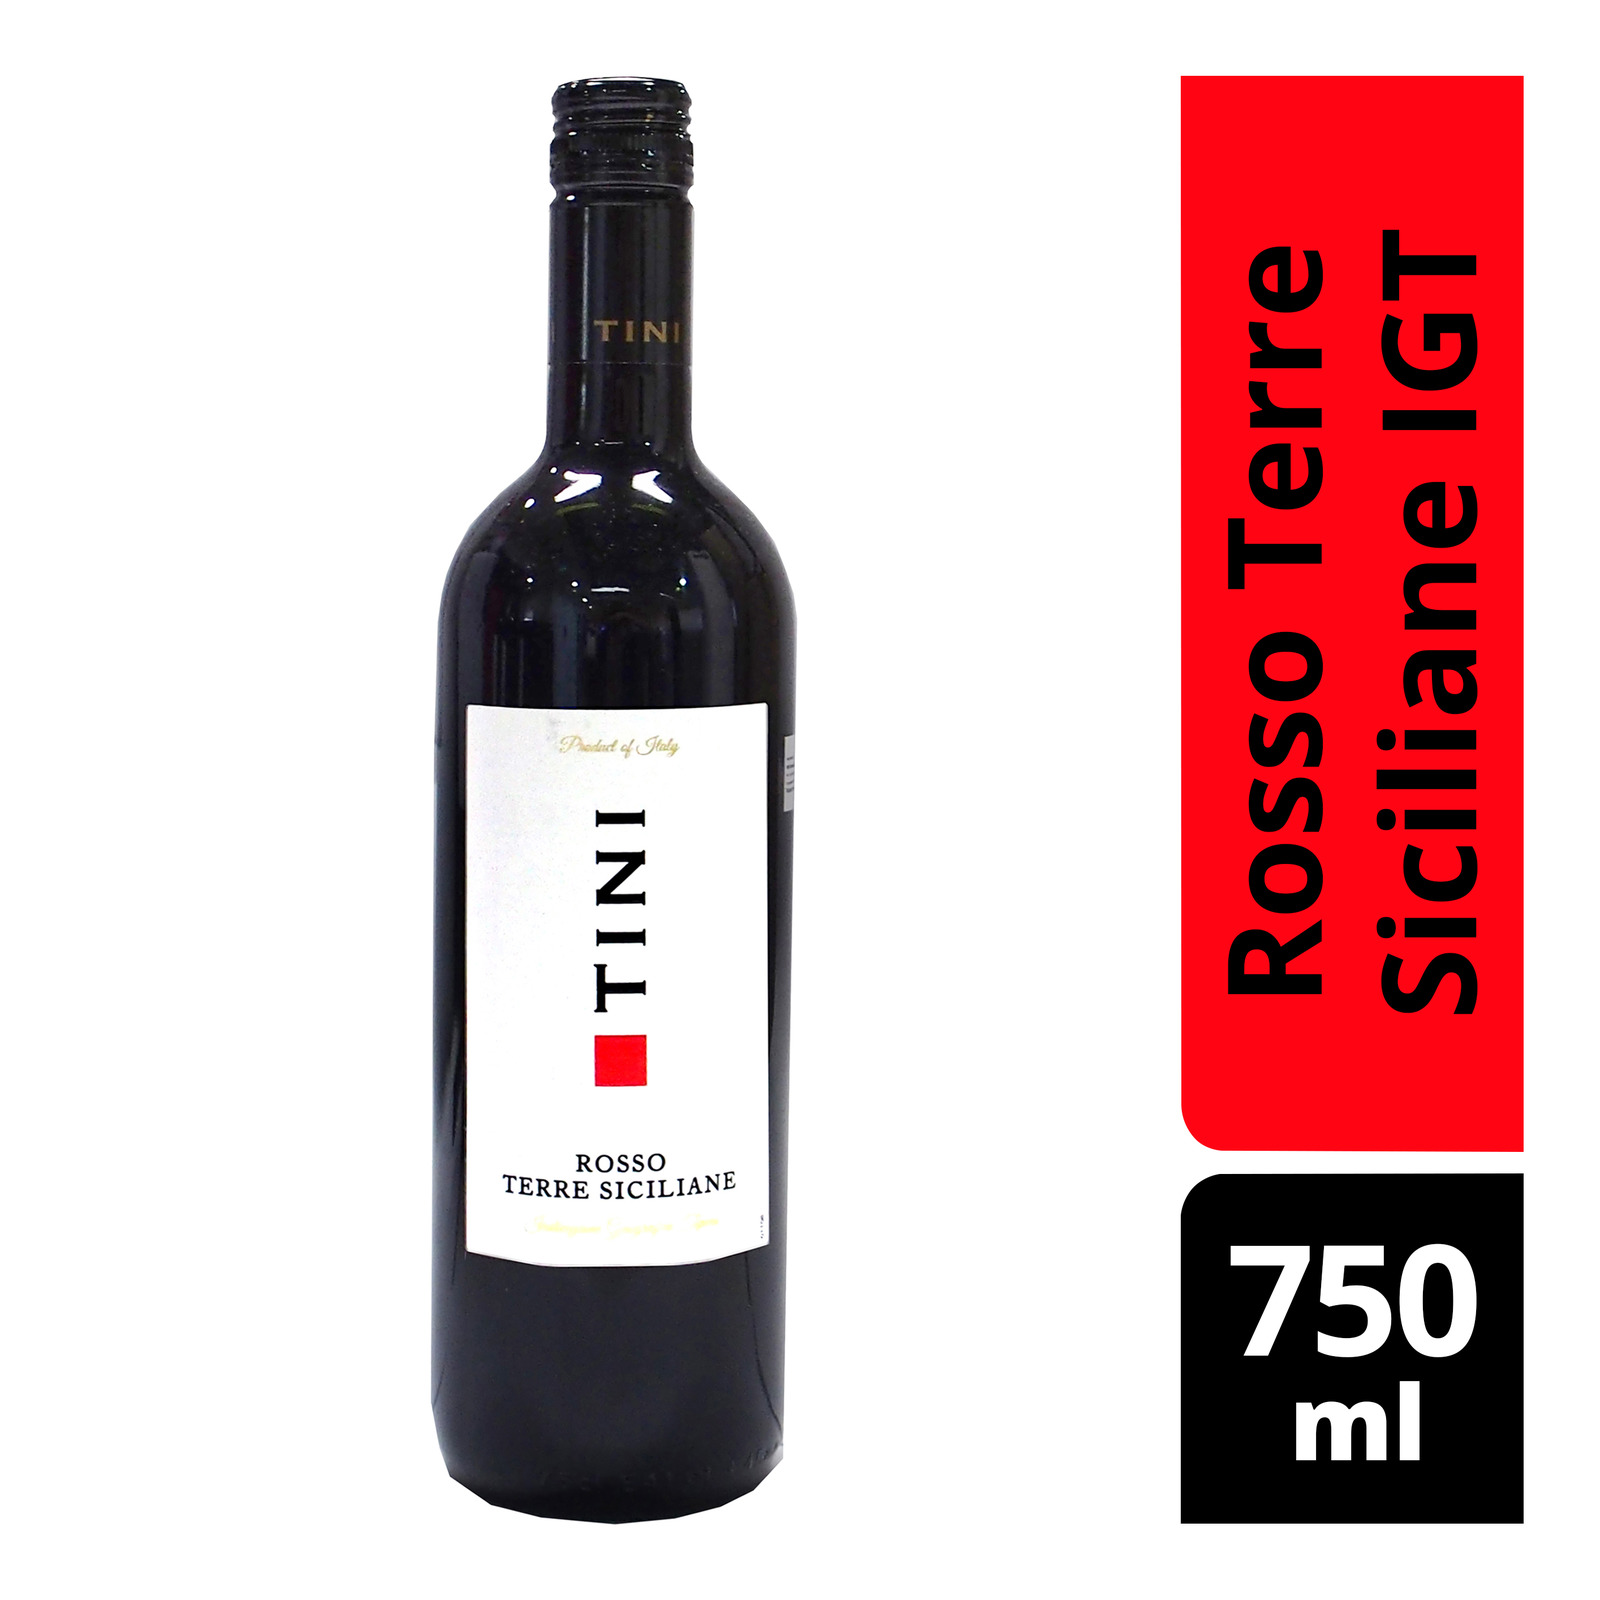 Tini Red Wine - Rosso Terre Siciliane IGT